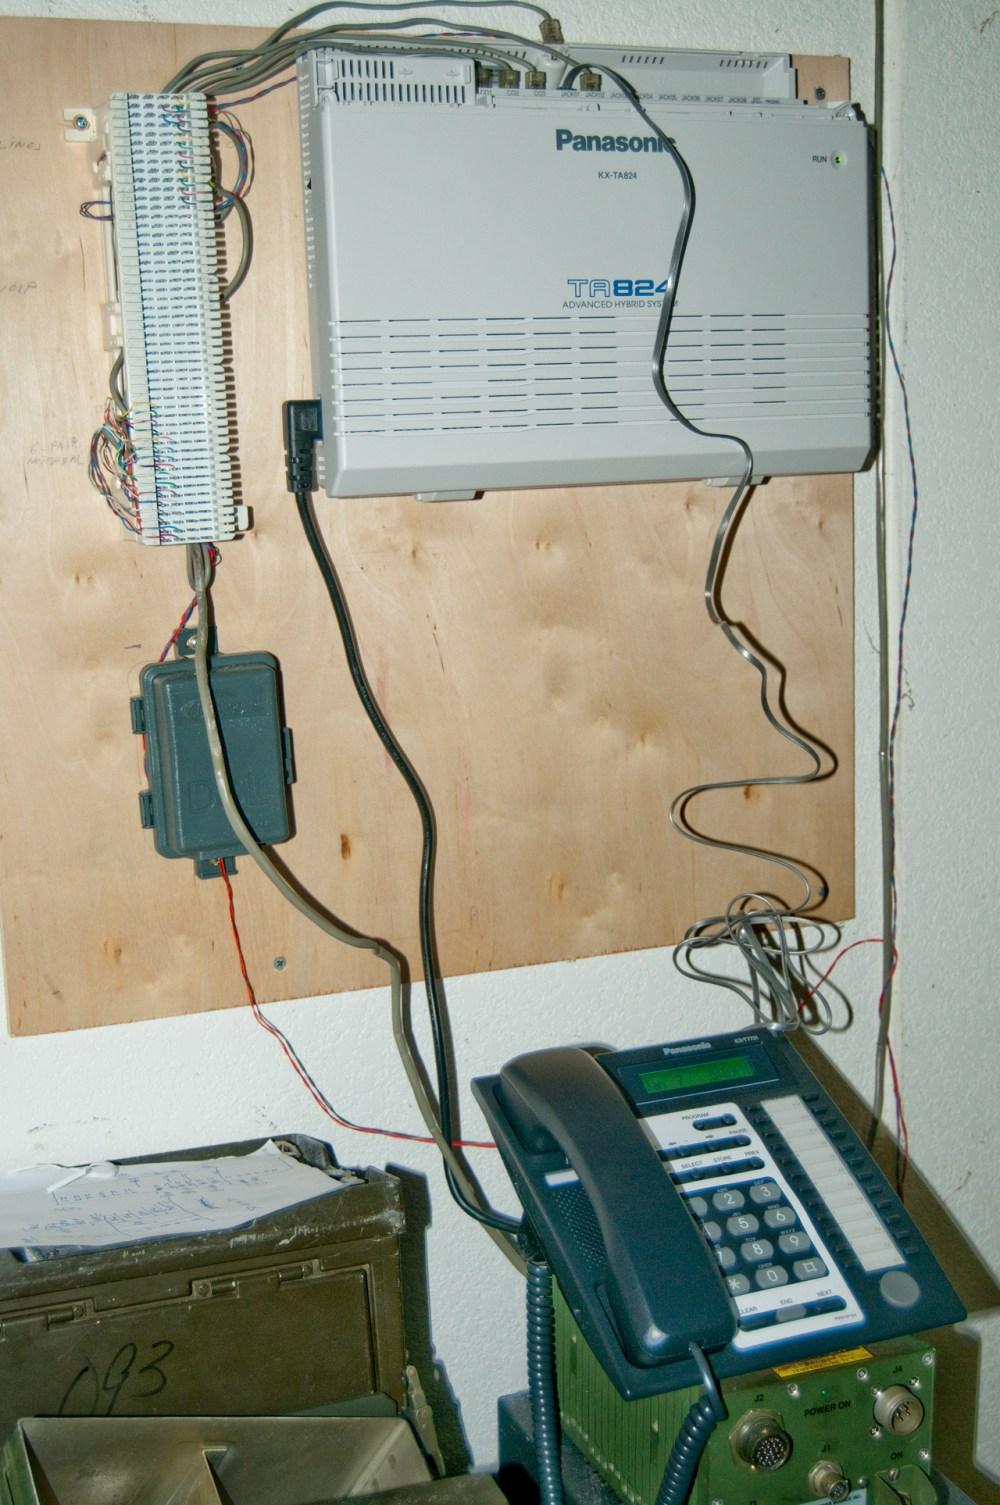 medium resolution of panasonic kx ta824 telephone system